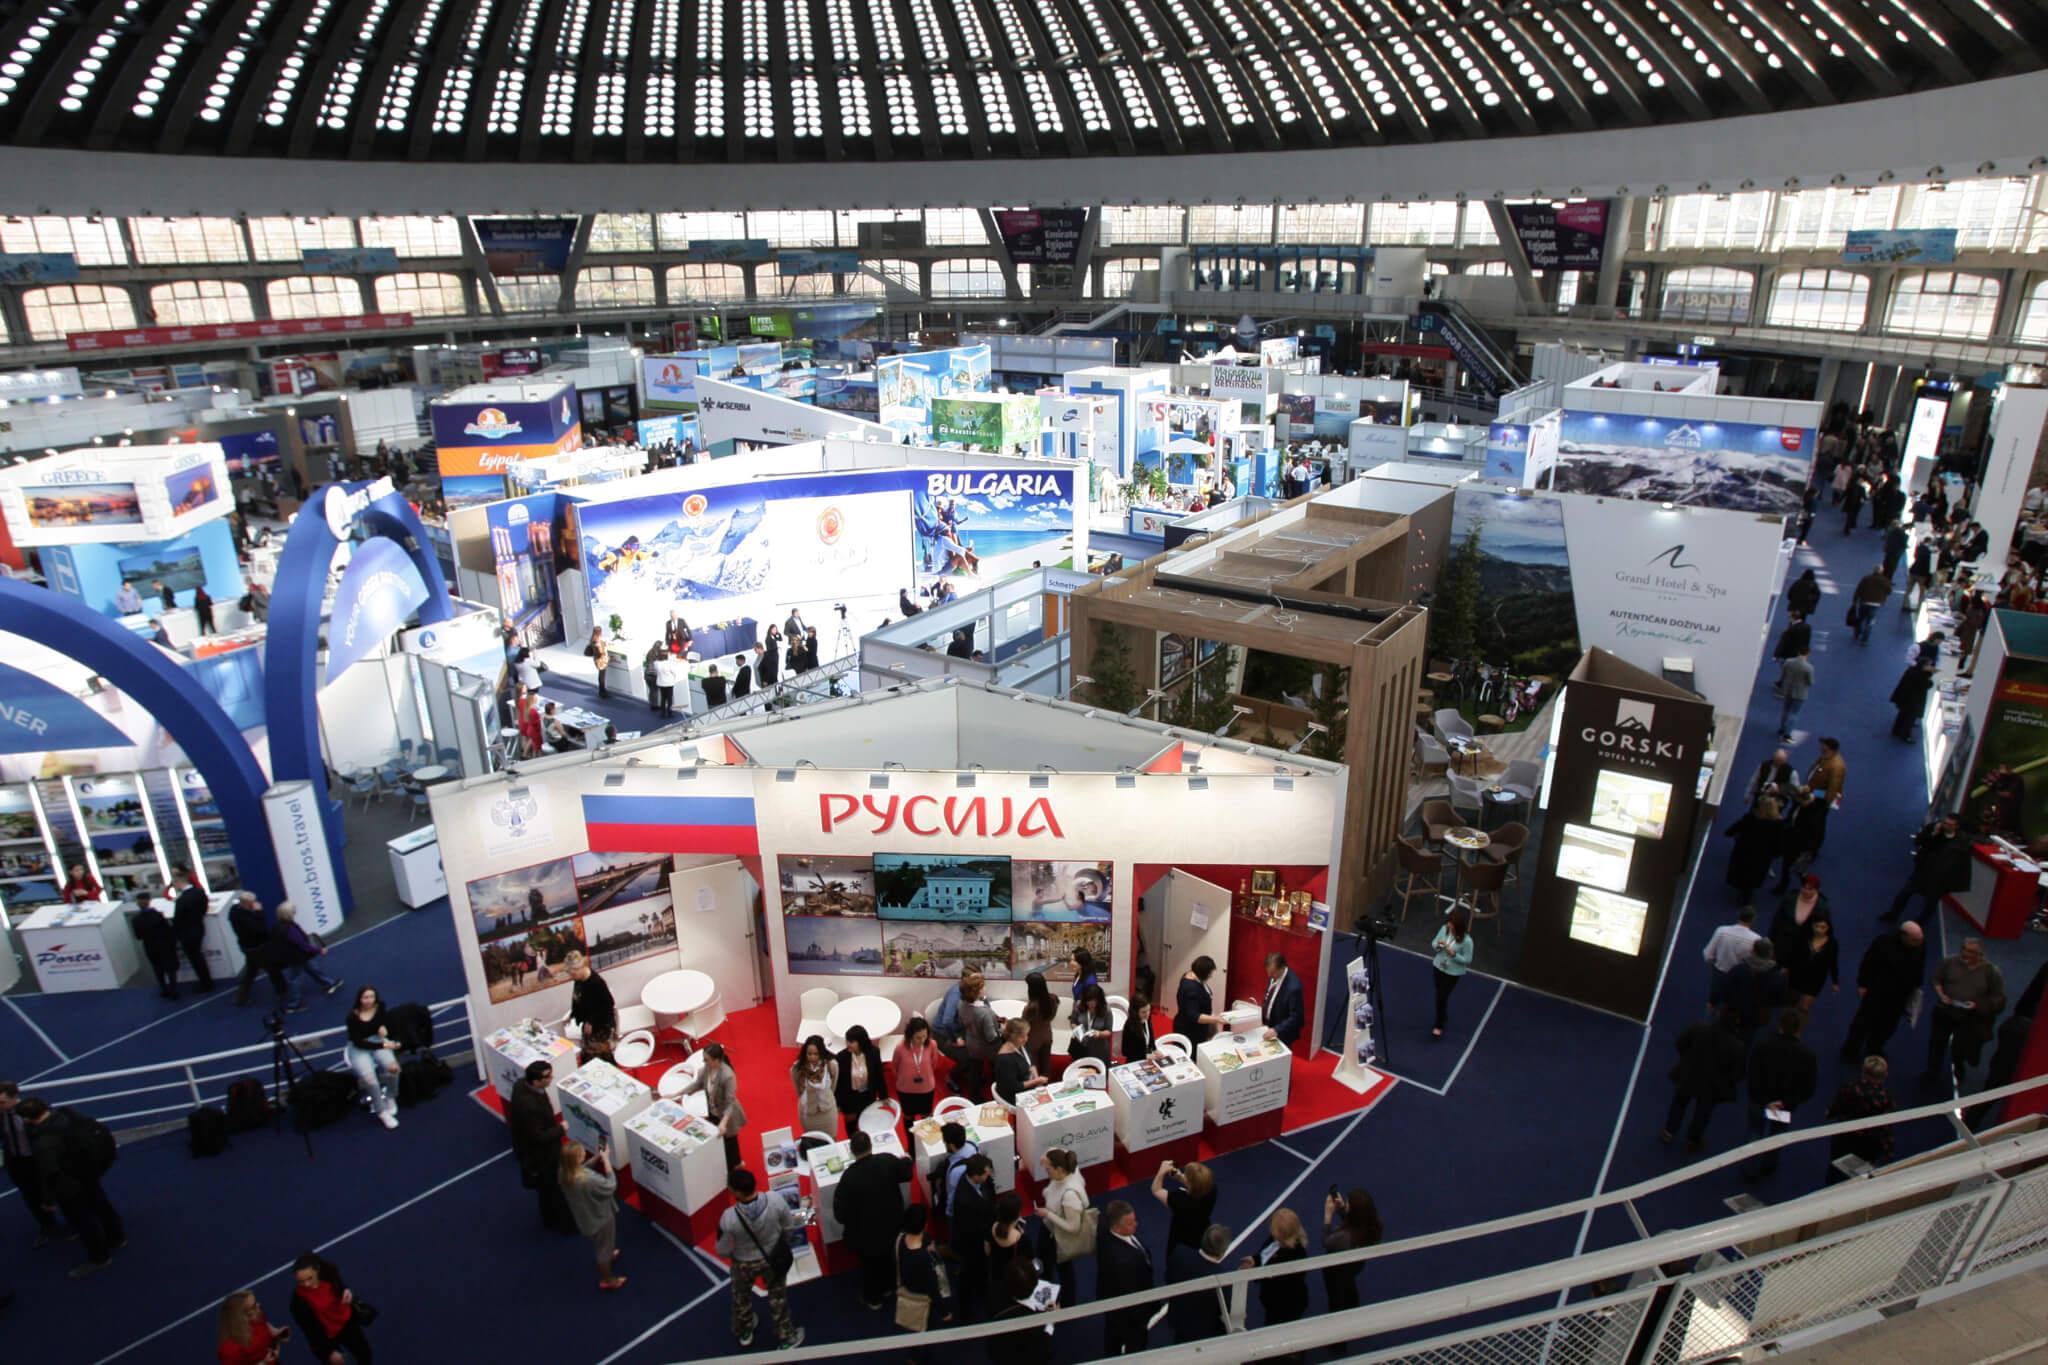 Exhibition in Belgrade will present the tourist potential of Russian regions